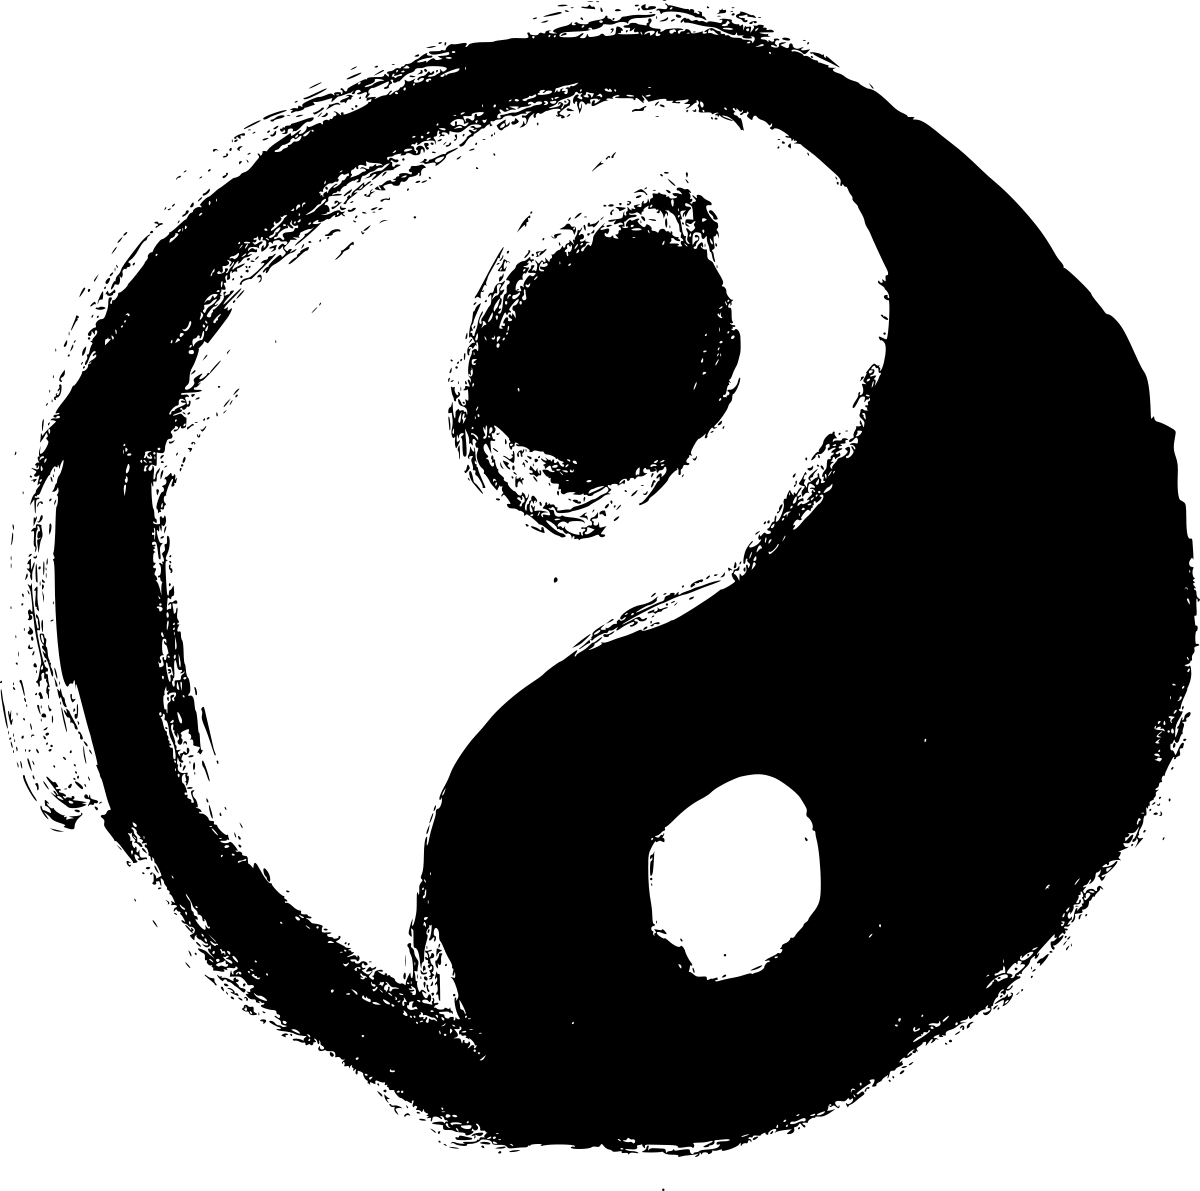 4 Grunge Yin Yang (PNG Transparent) | OnlyGFX.com